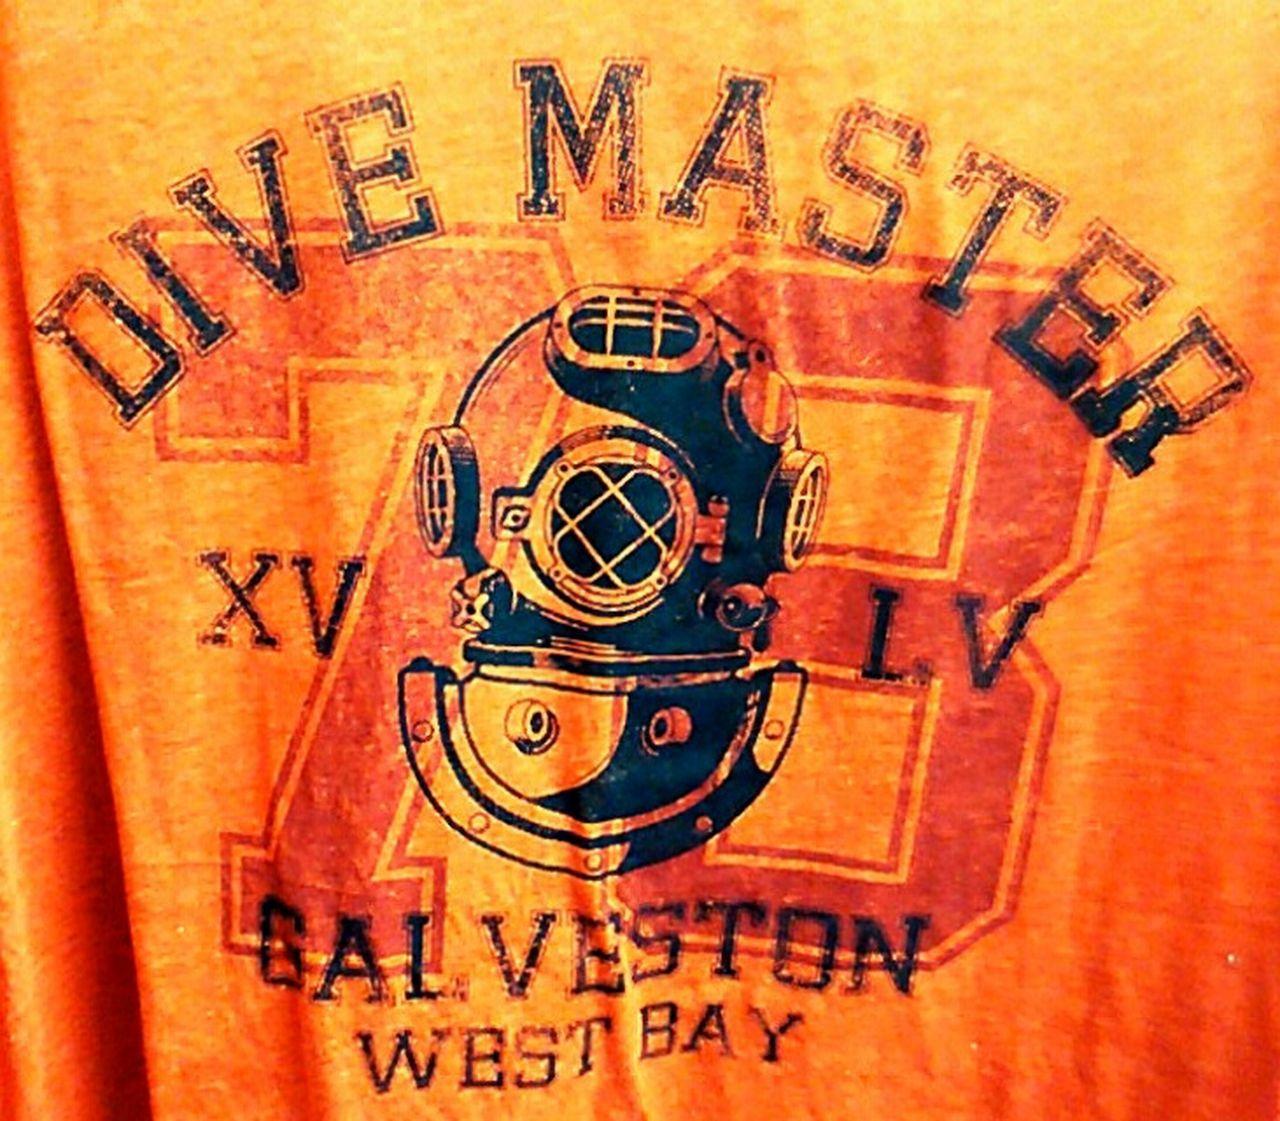 Dive Master Tshirt T Shirts 78 T Shirt Tee Shirt Tshirts T Shirt Collection West Bay Westbay Tshirt♡ Tshirtmaniac Tshirtoftheday T Shirt T Shirt Design Teeshirts Tshirtporn Tshirtcollection Teeshirt Tees T Shirt Deep Sea Diving Deep Sea Diver DeepseaDiving Deepseadiver